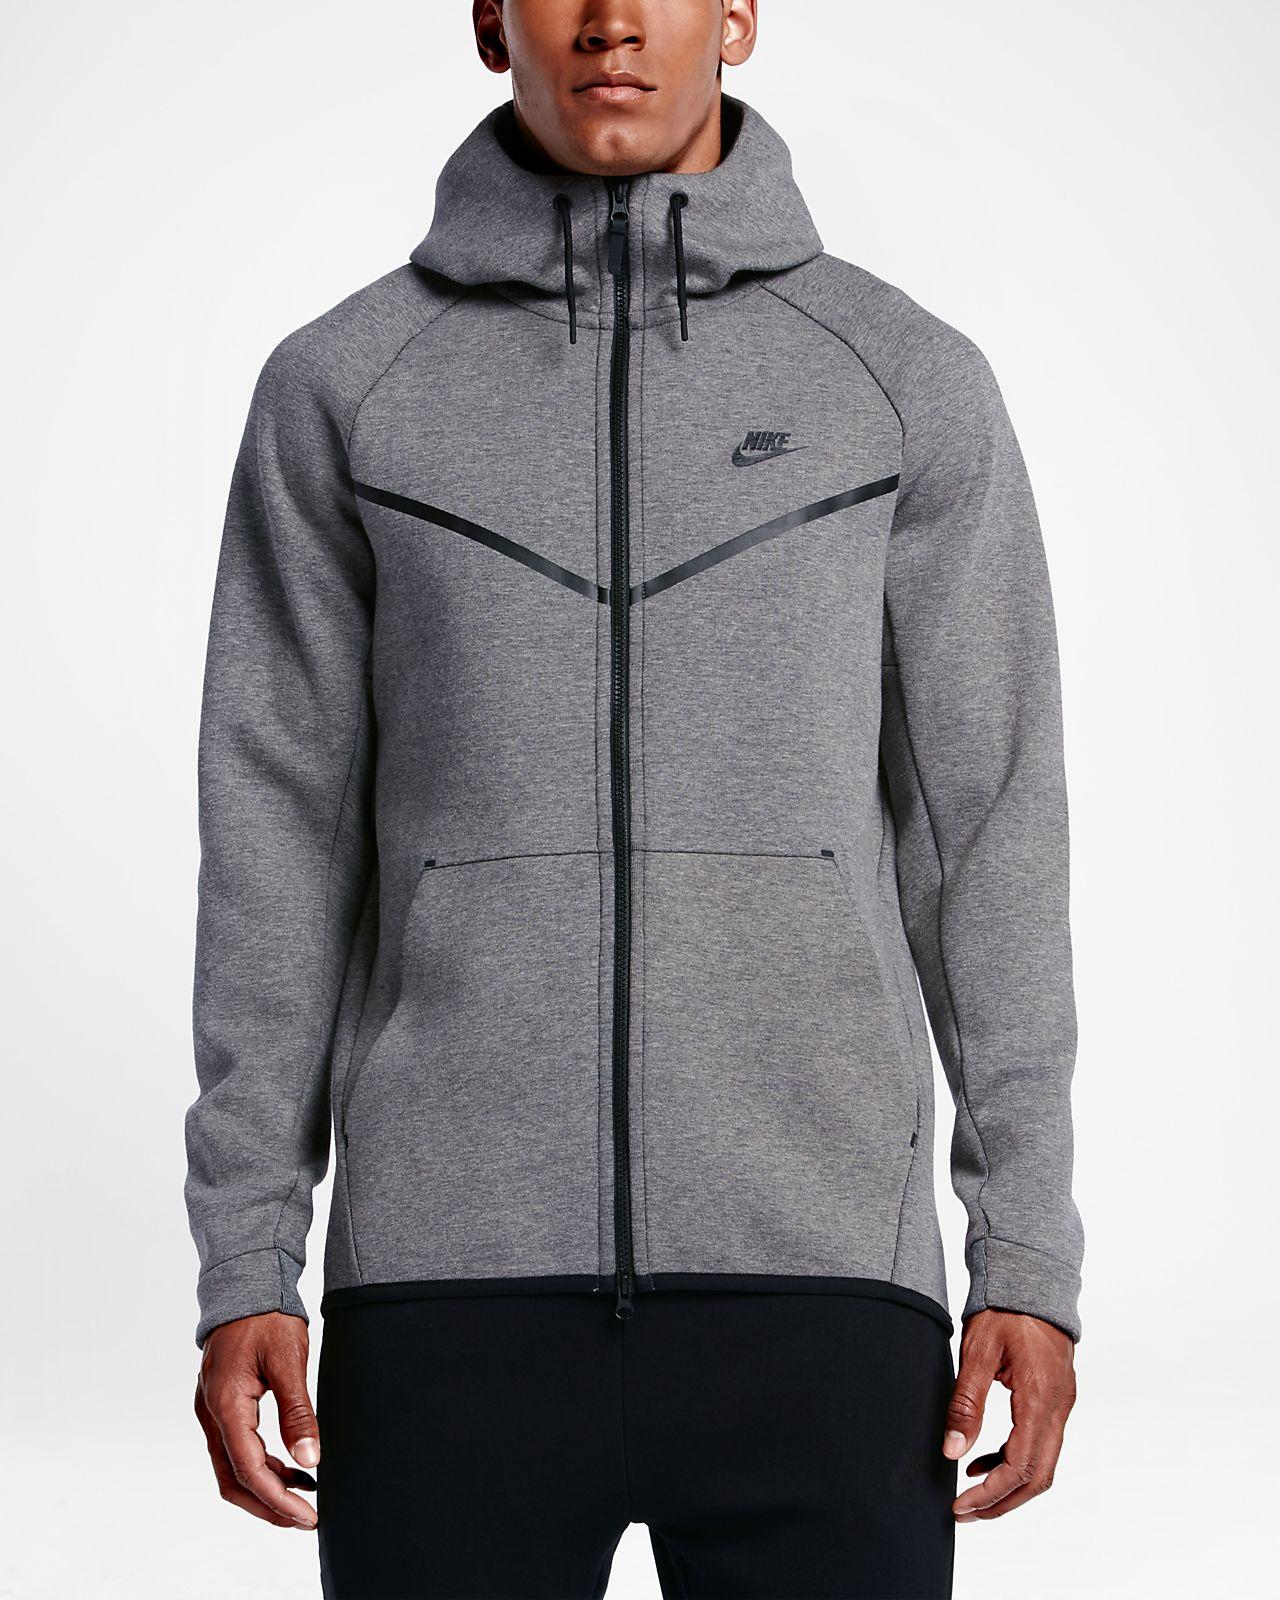 Réduction authentique nike sportswear tech fleece windrunner noir ... f3f0c497c5b6